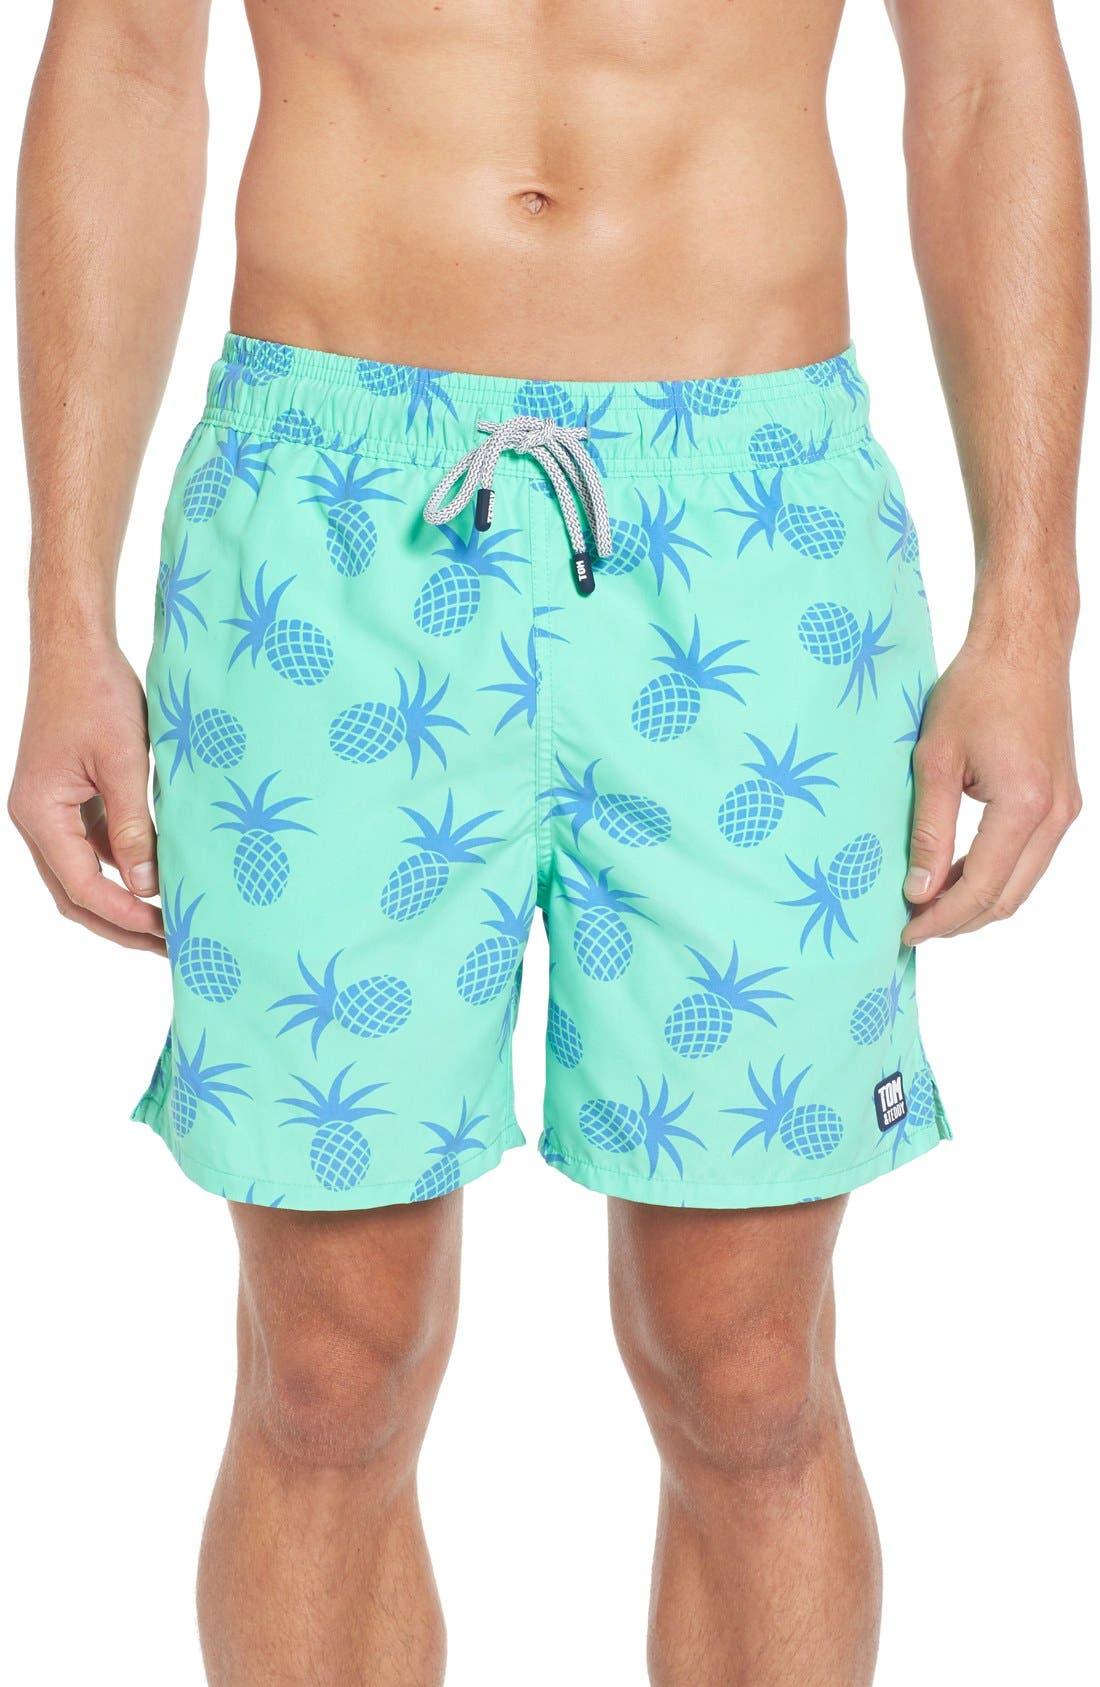 Pineapple Print Swim Trunks,                         Main,                         color, Jade Green